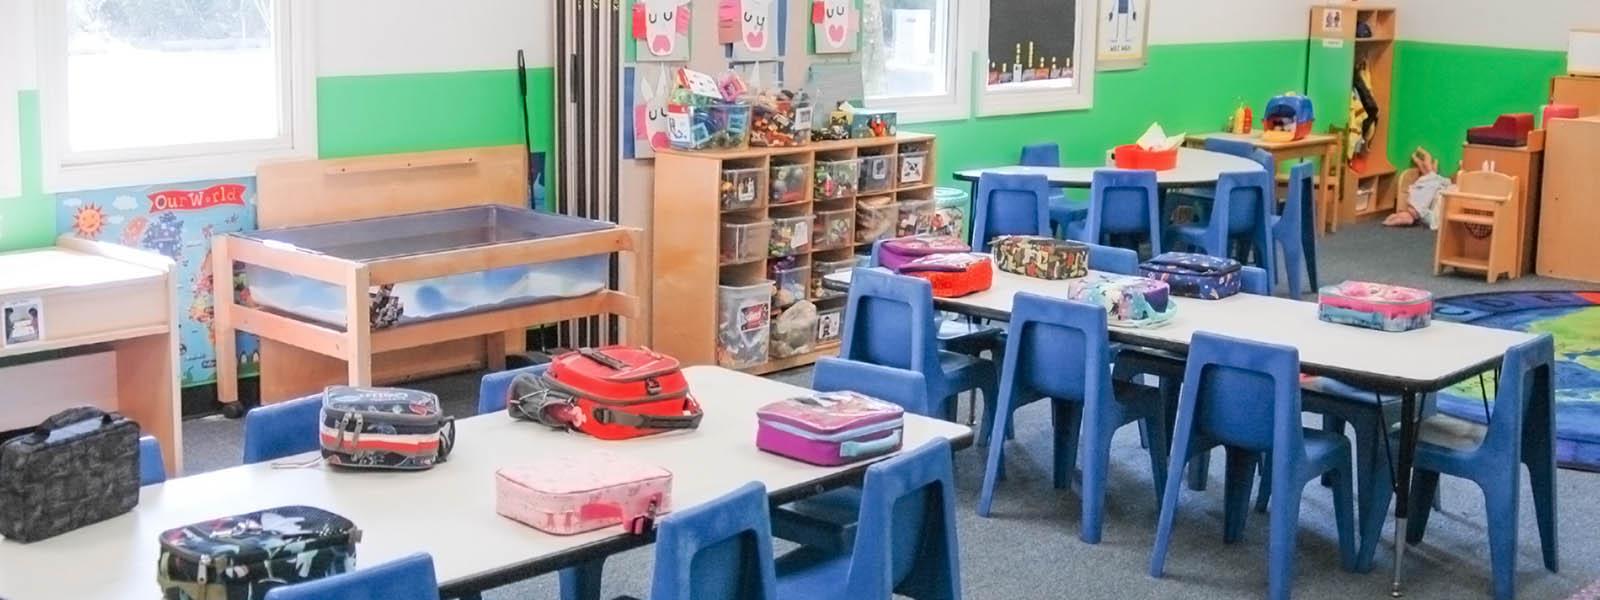 SIPC Day School Classroom